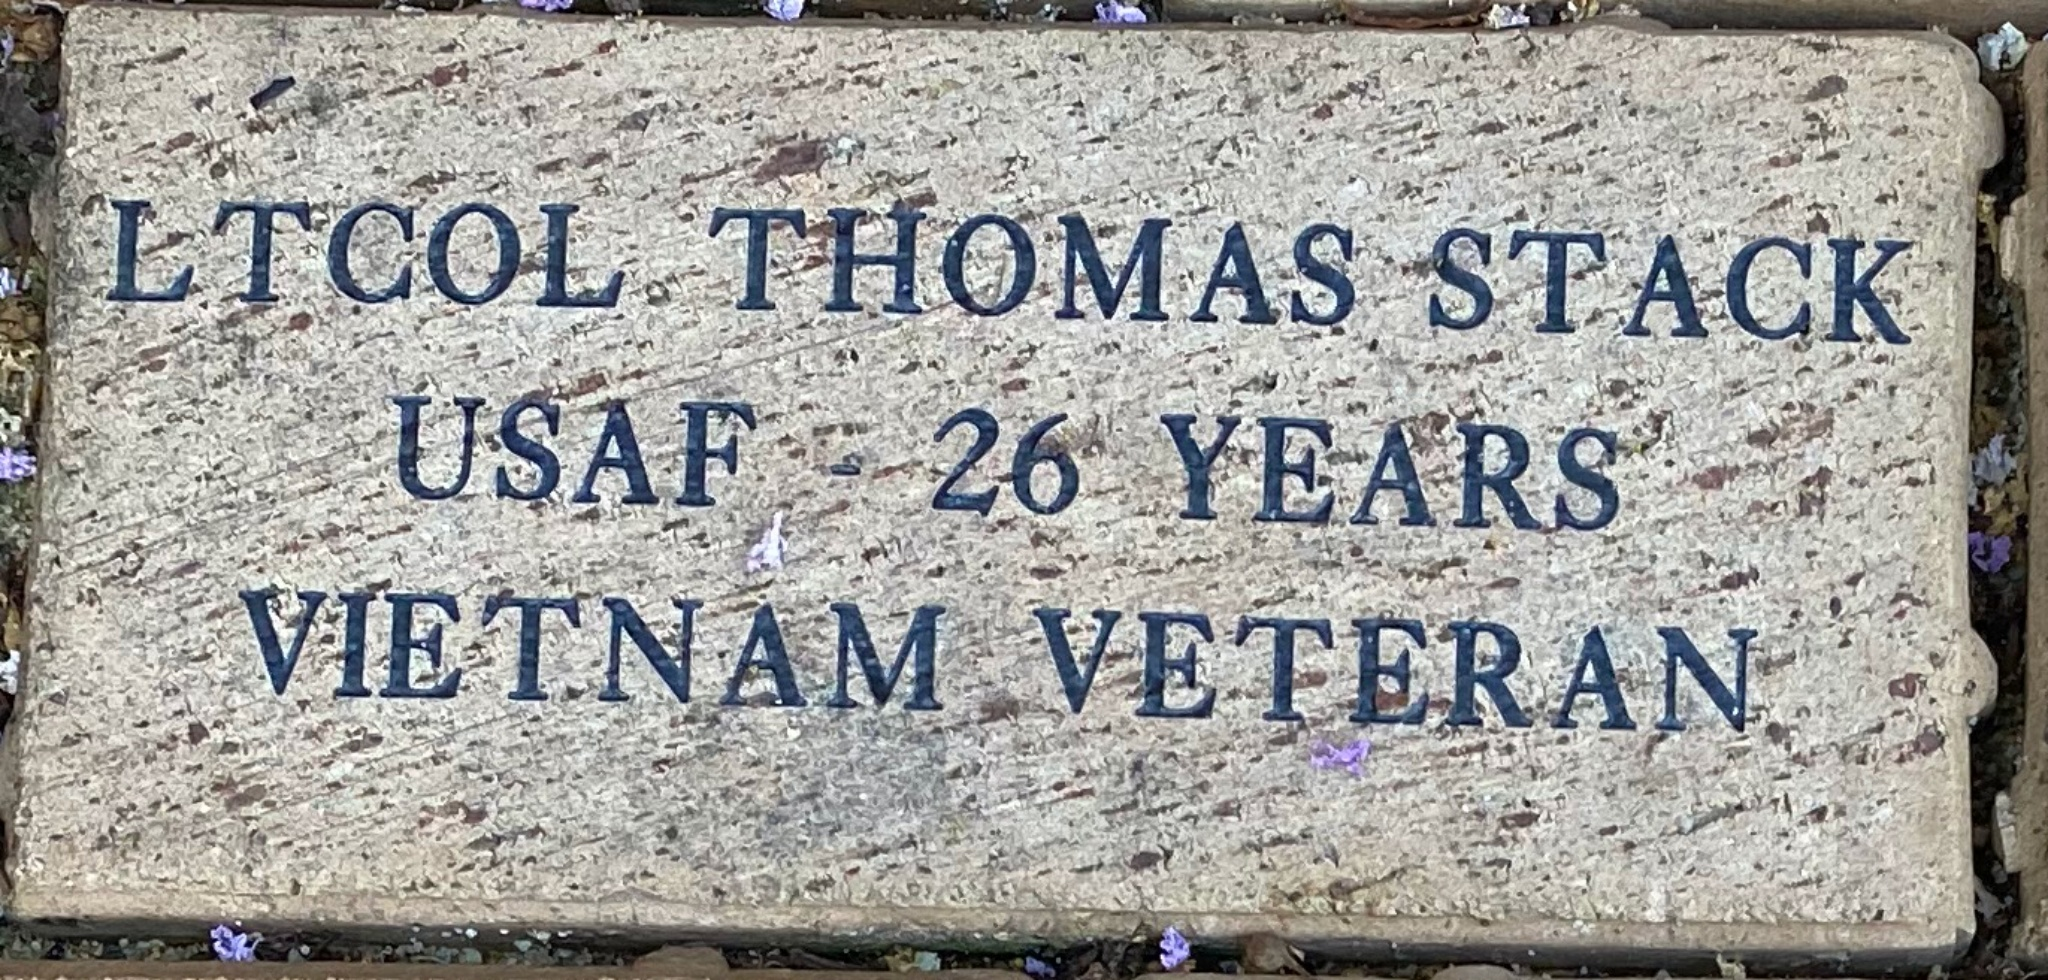 LTCOL THOMAS STACK USAF – 26 YEARS VIETNAM VETERAN